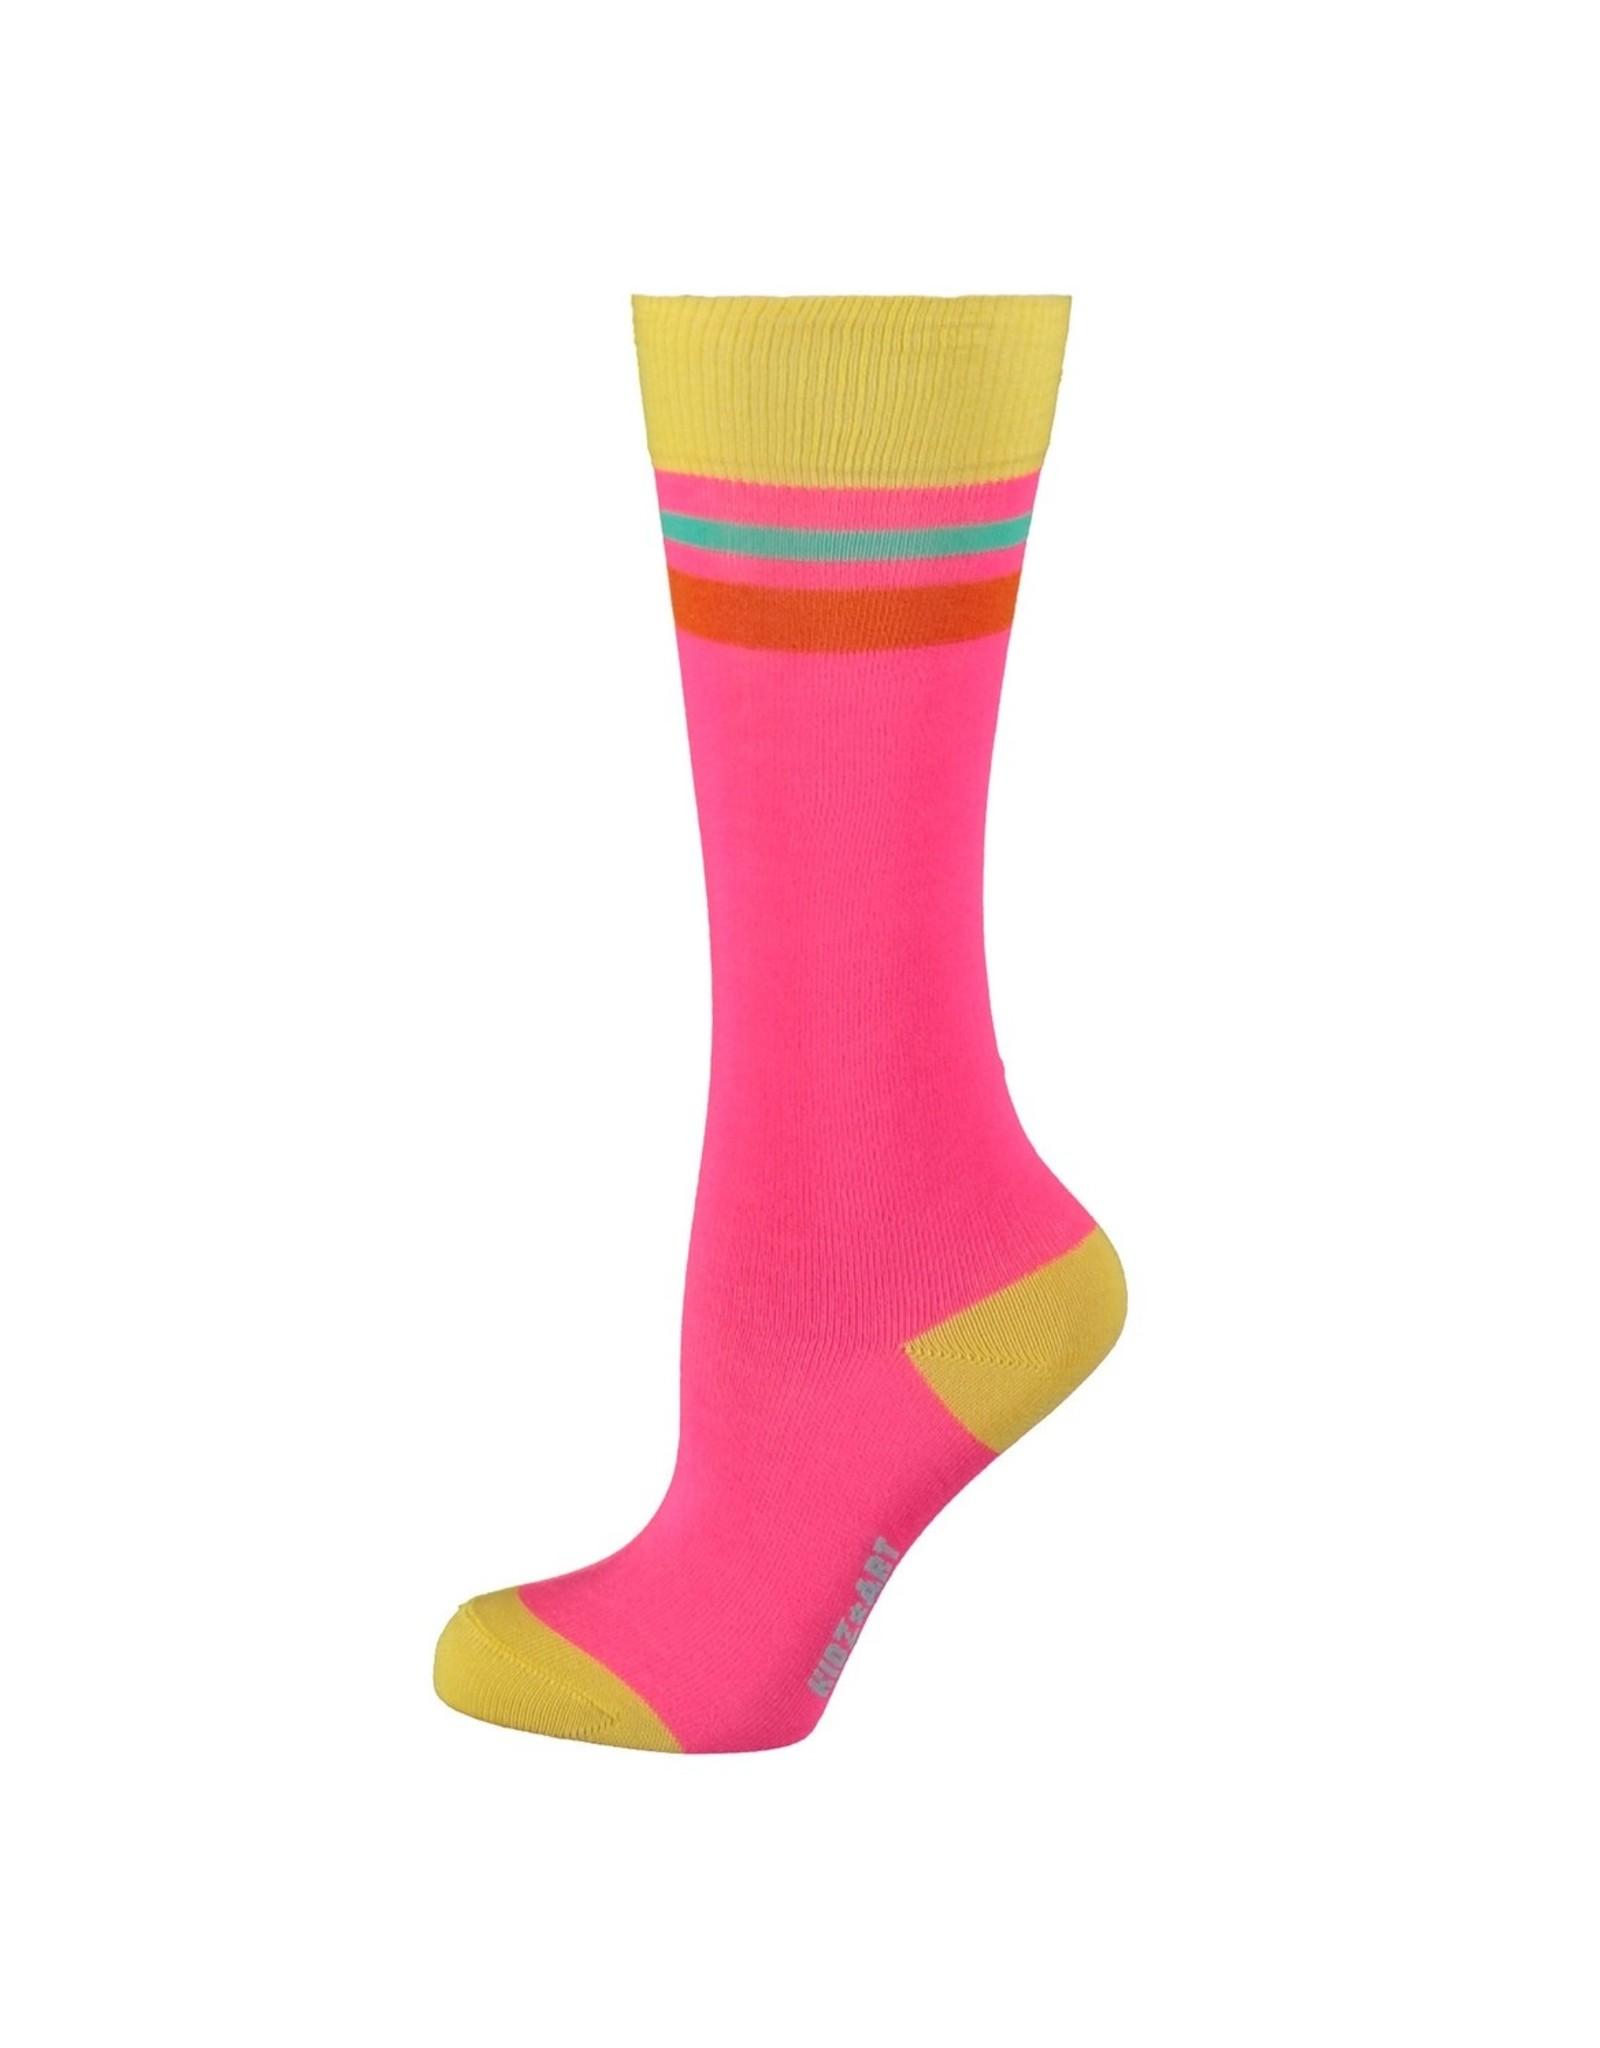 Kidz-Art Knee high socks plain with stripes